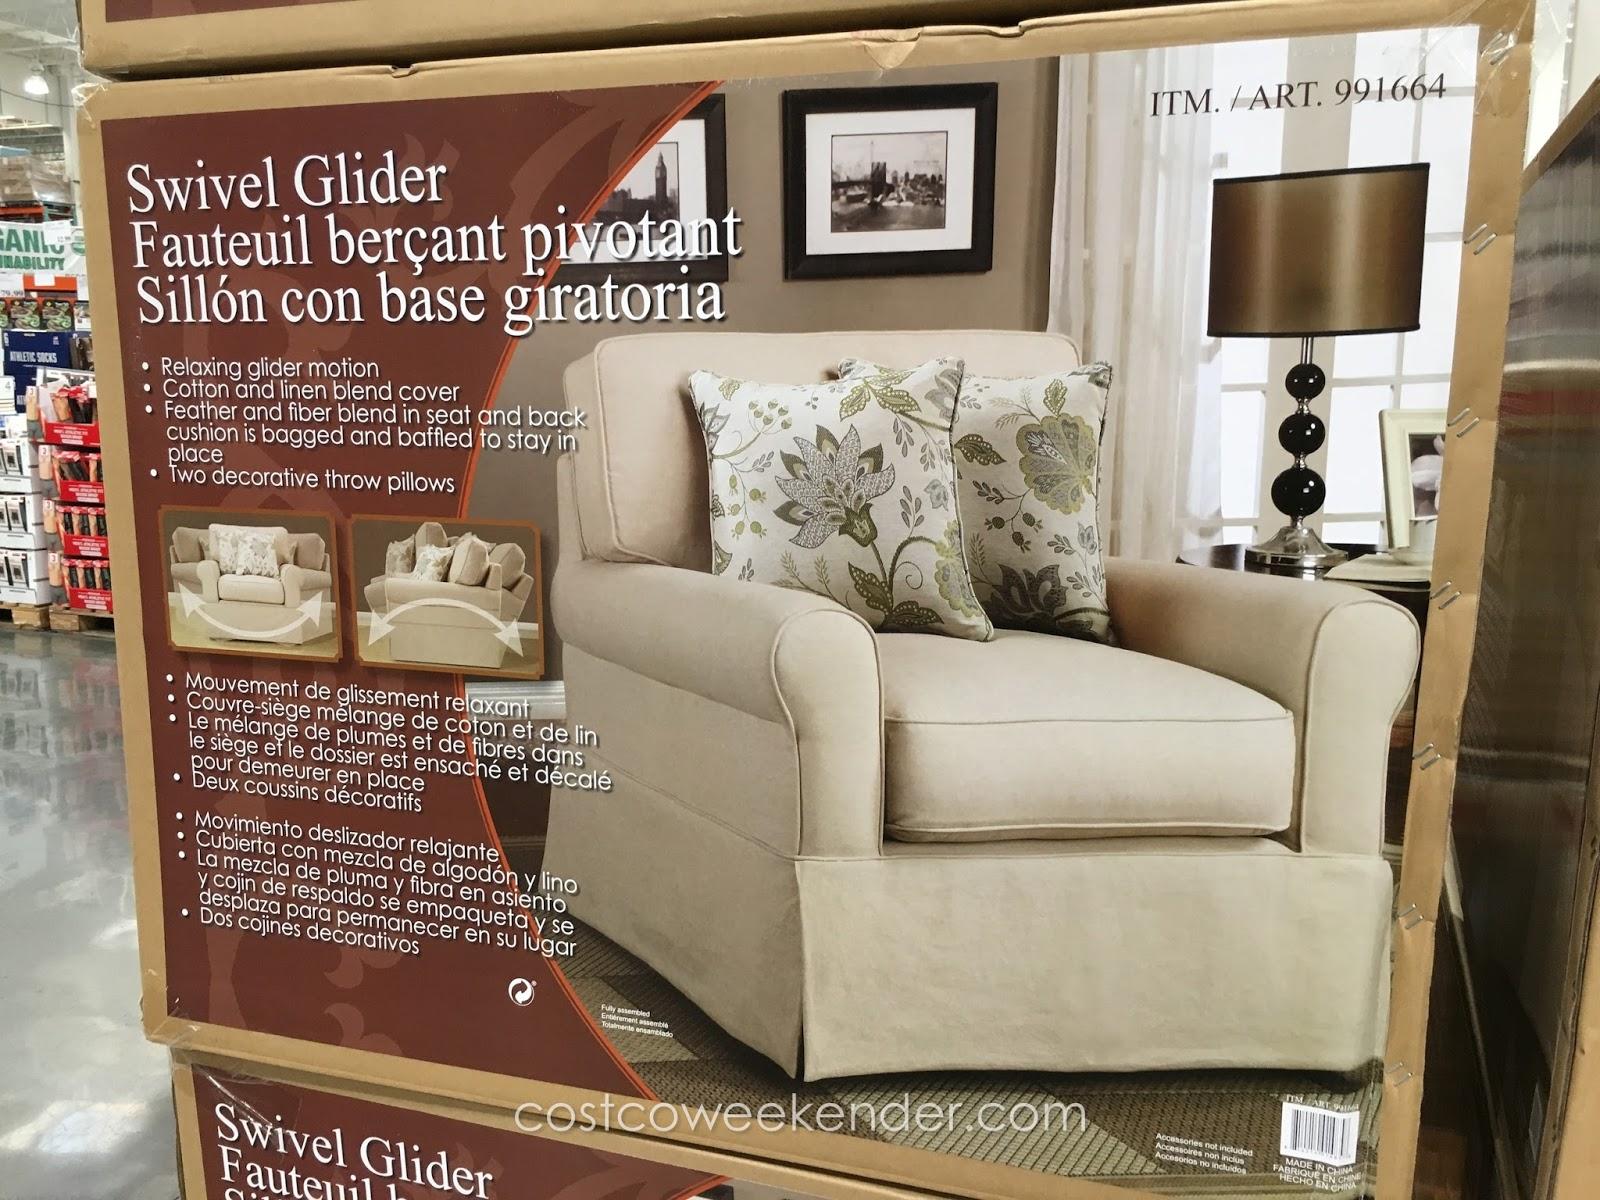 Synergy Swivel Glider Chair Costco Weekender